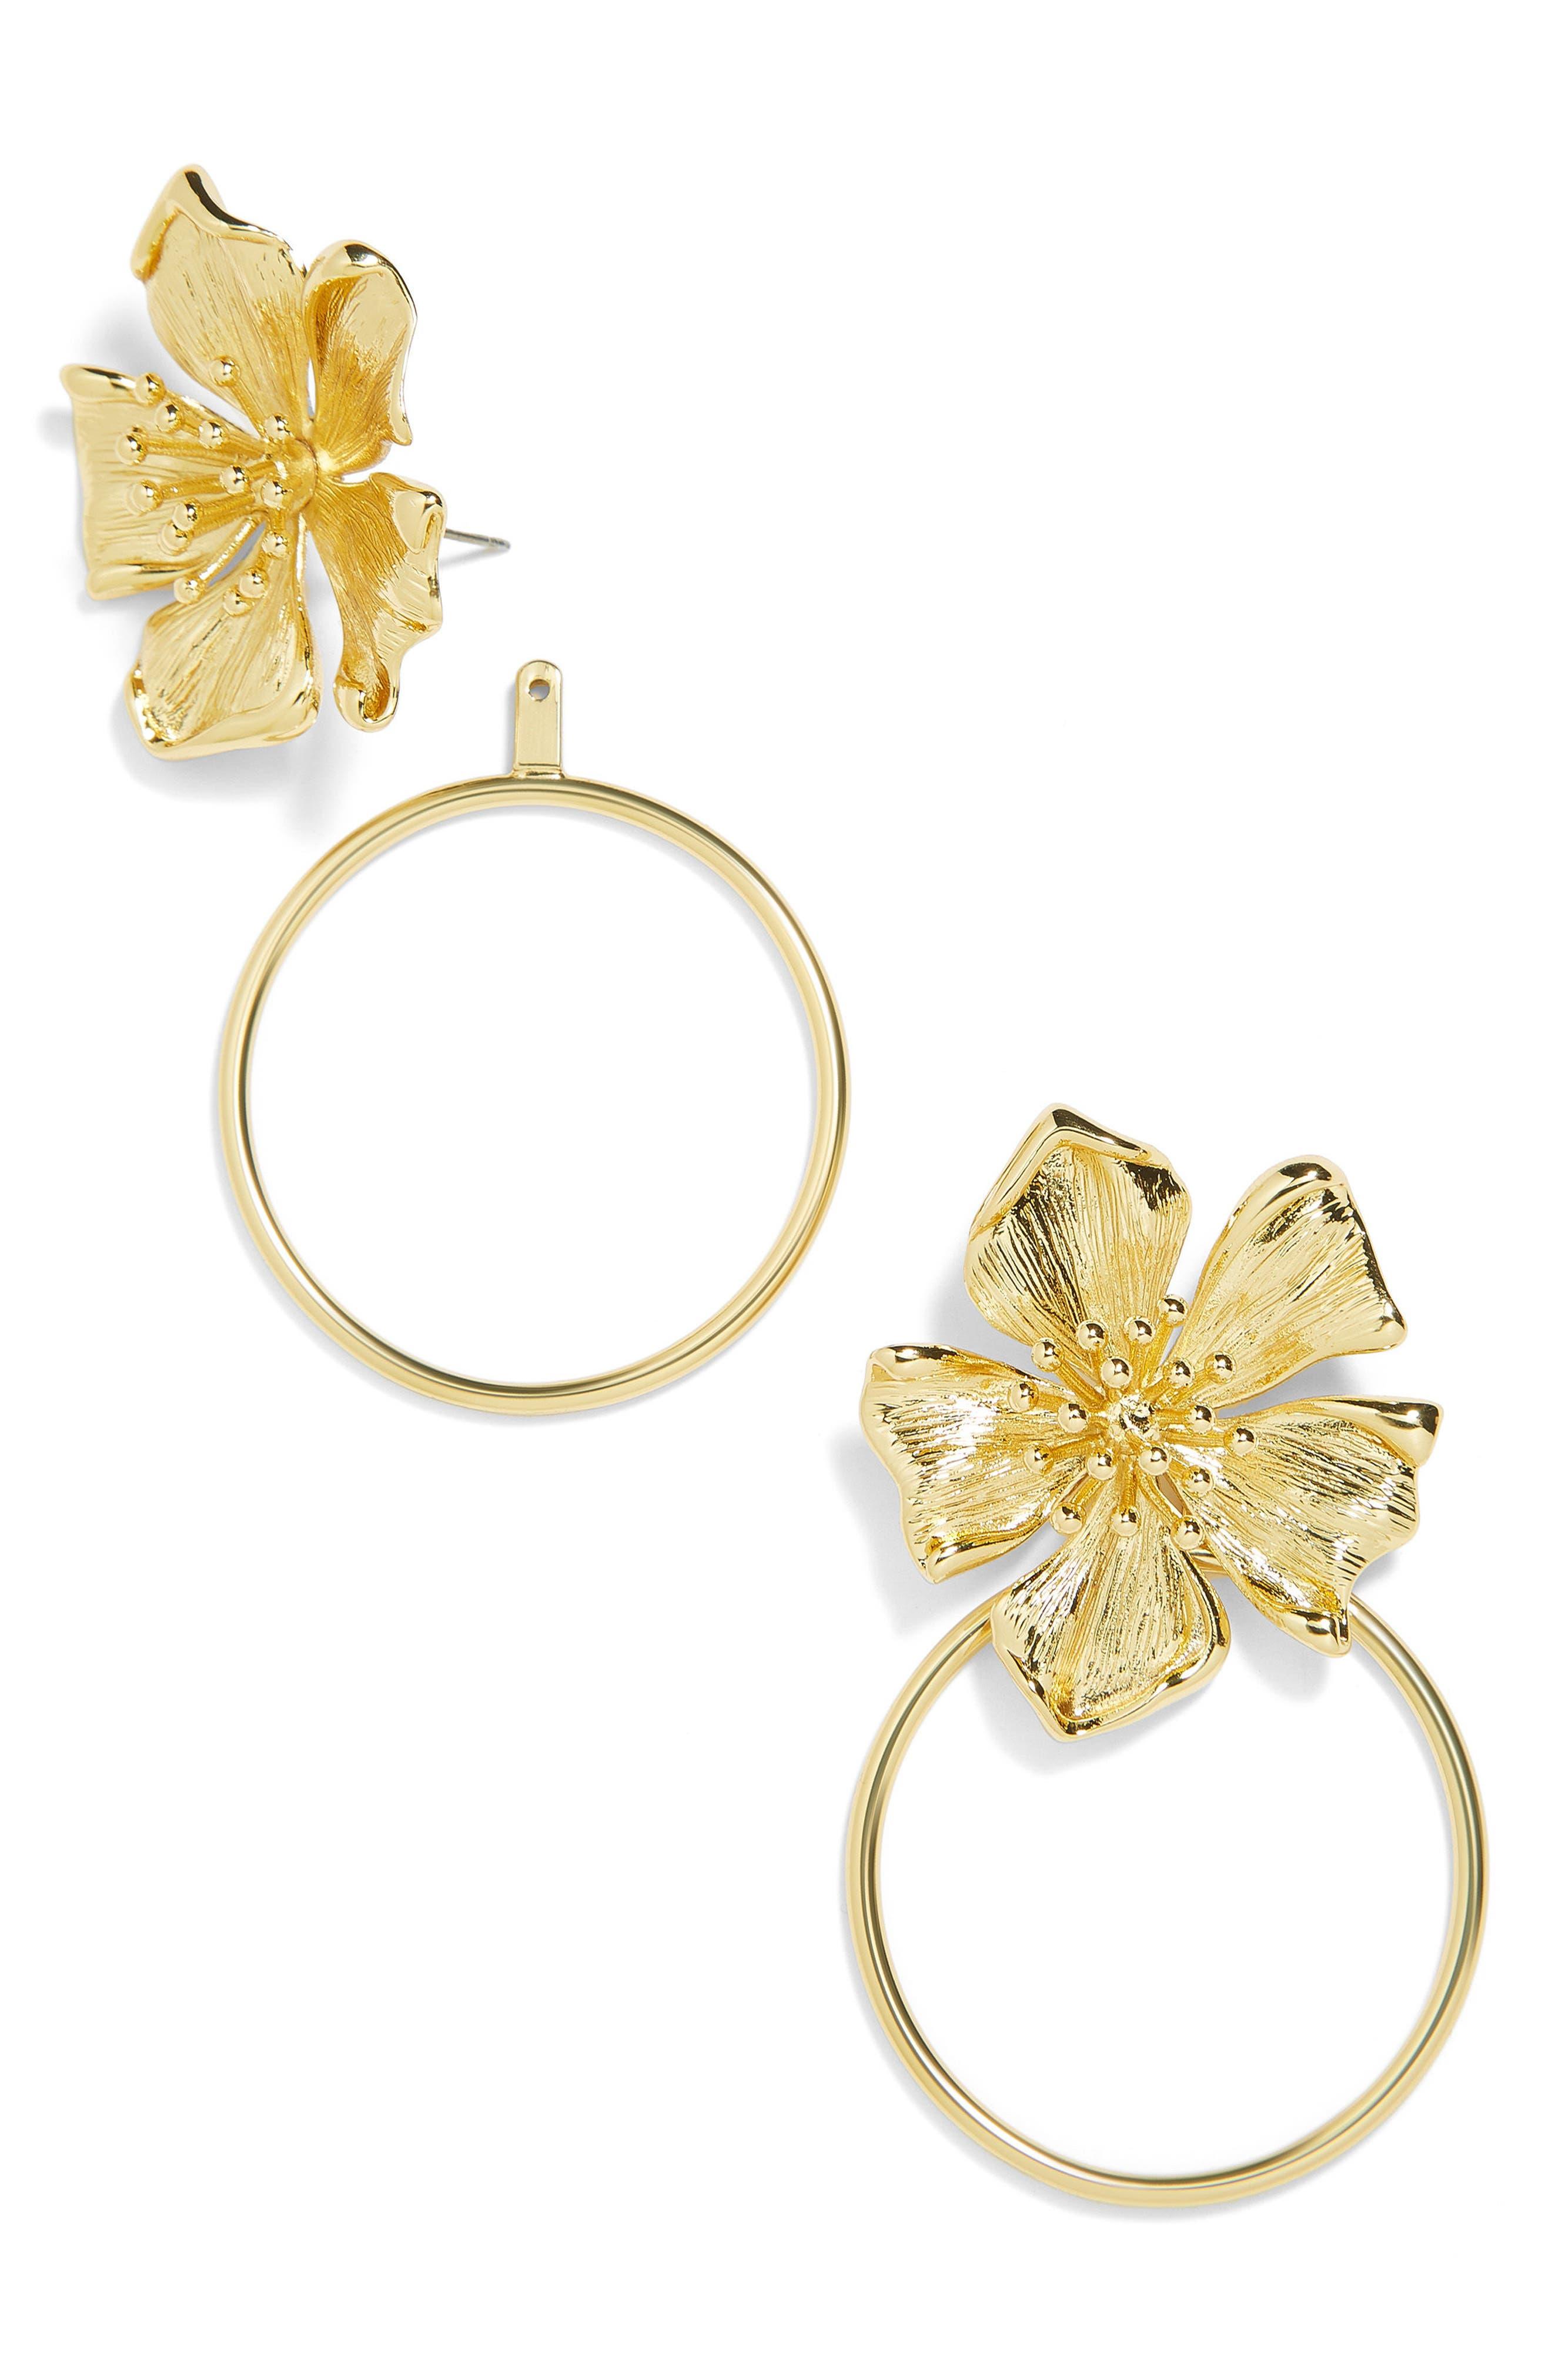 Penthia Hoop Earrings,                             Main thumbnail 1, color,                             GOLD